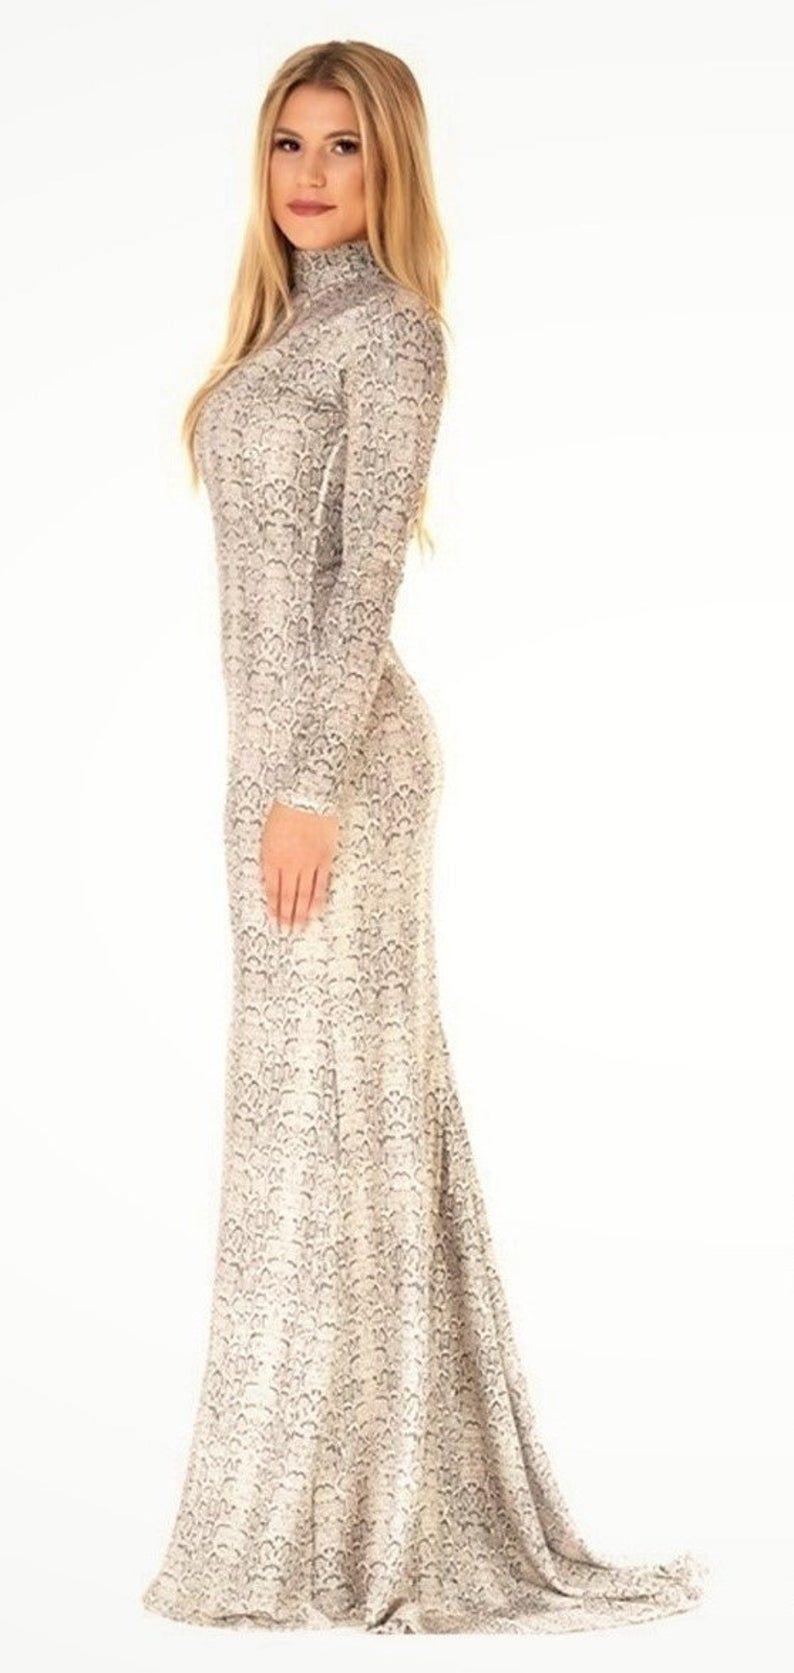 Maxi Bodycon With Train Champagne Dress Long Sleeves Mock Etsy Champagne Dresses Long Mock Neck Bodycon Dress Dresses [ 1673 x 794 Pixel ]